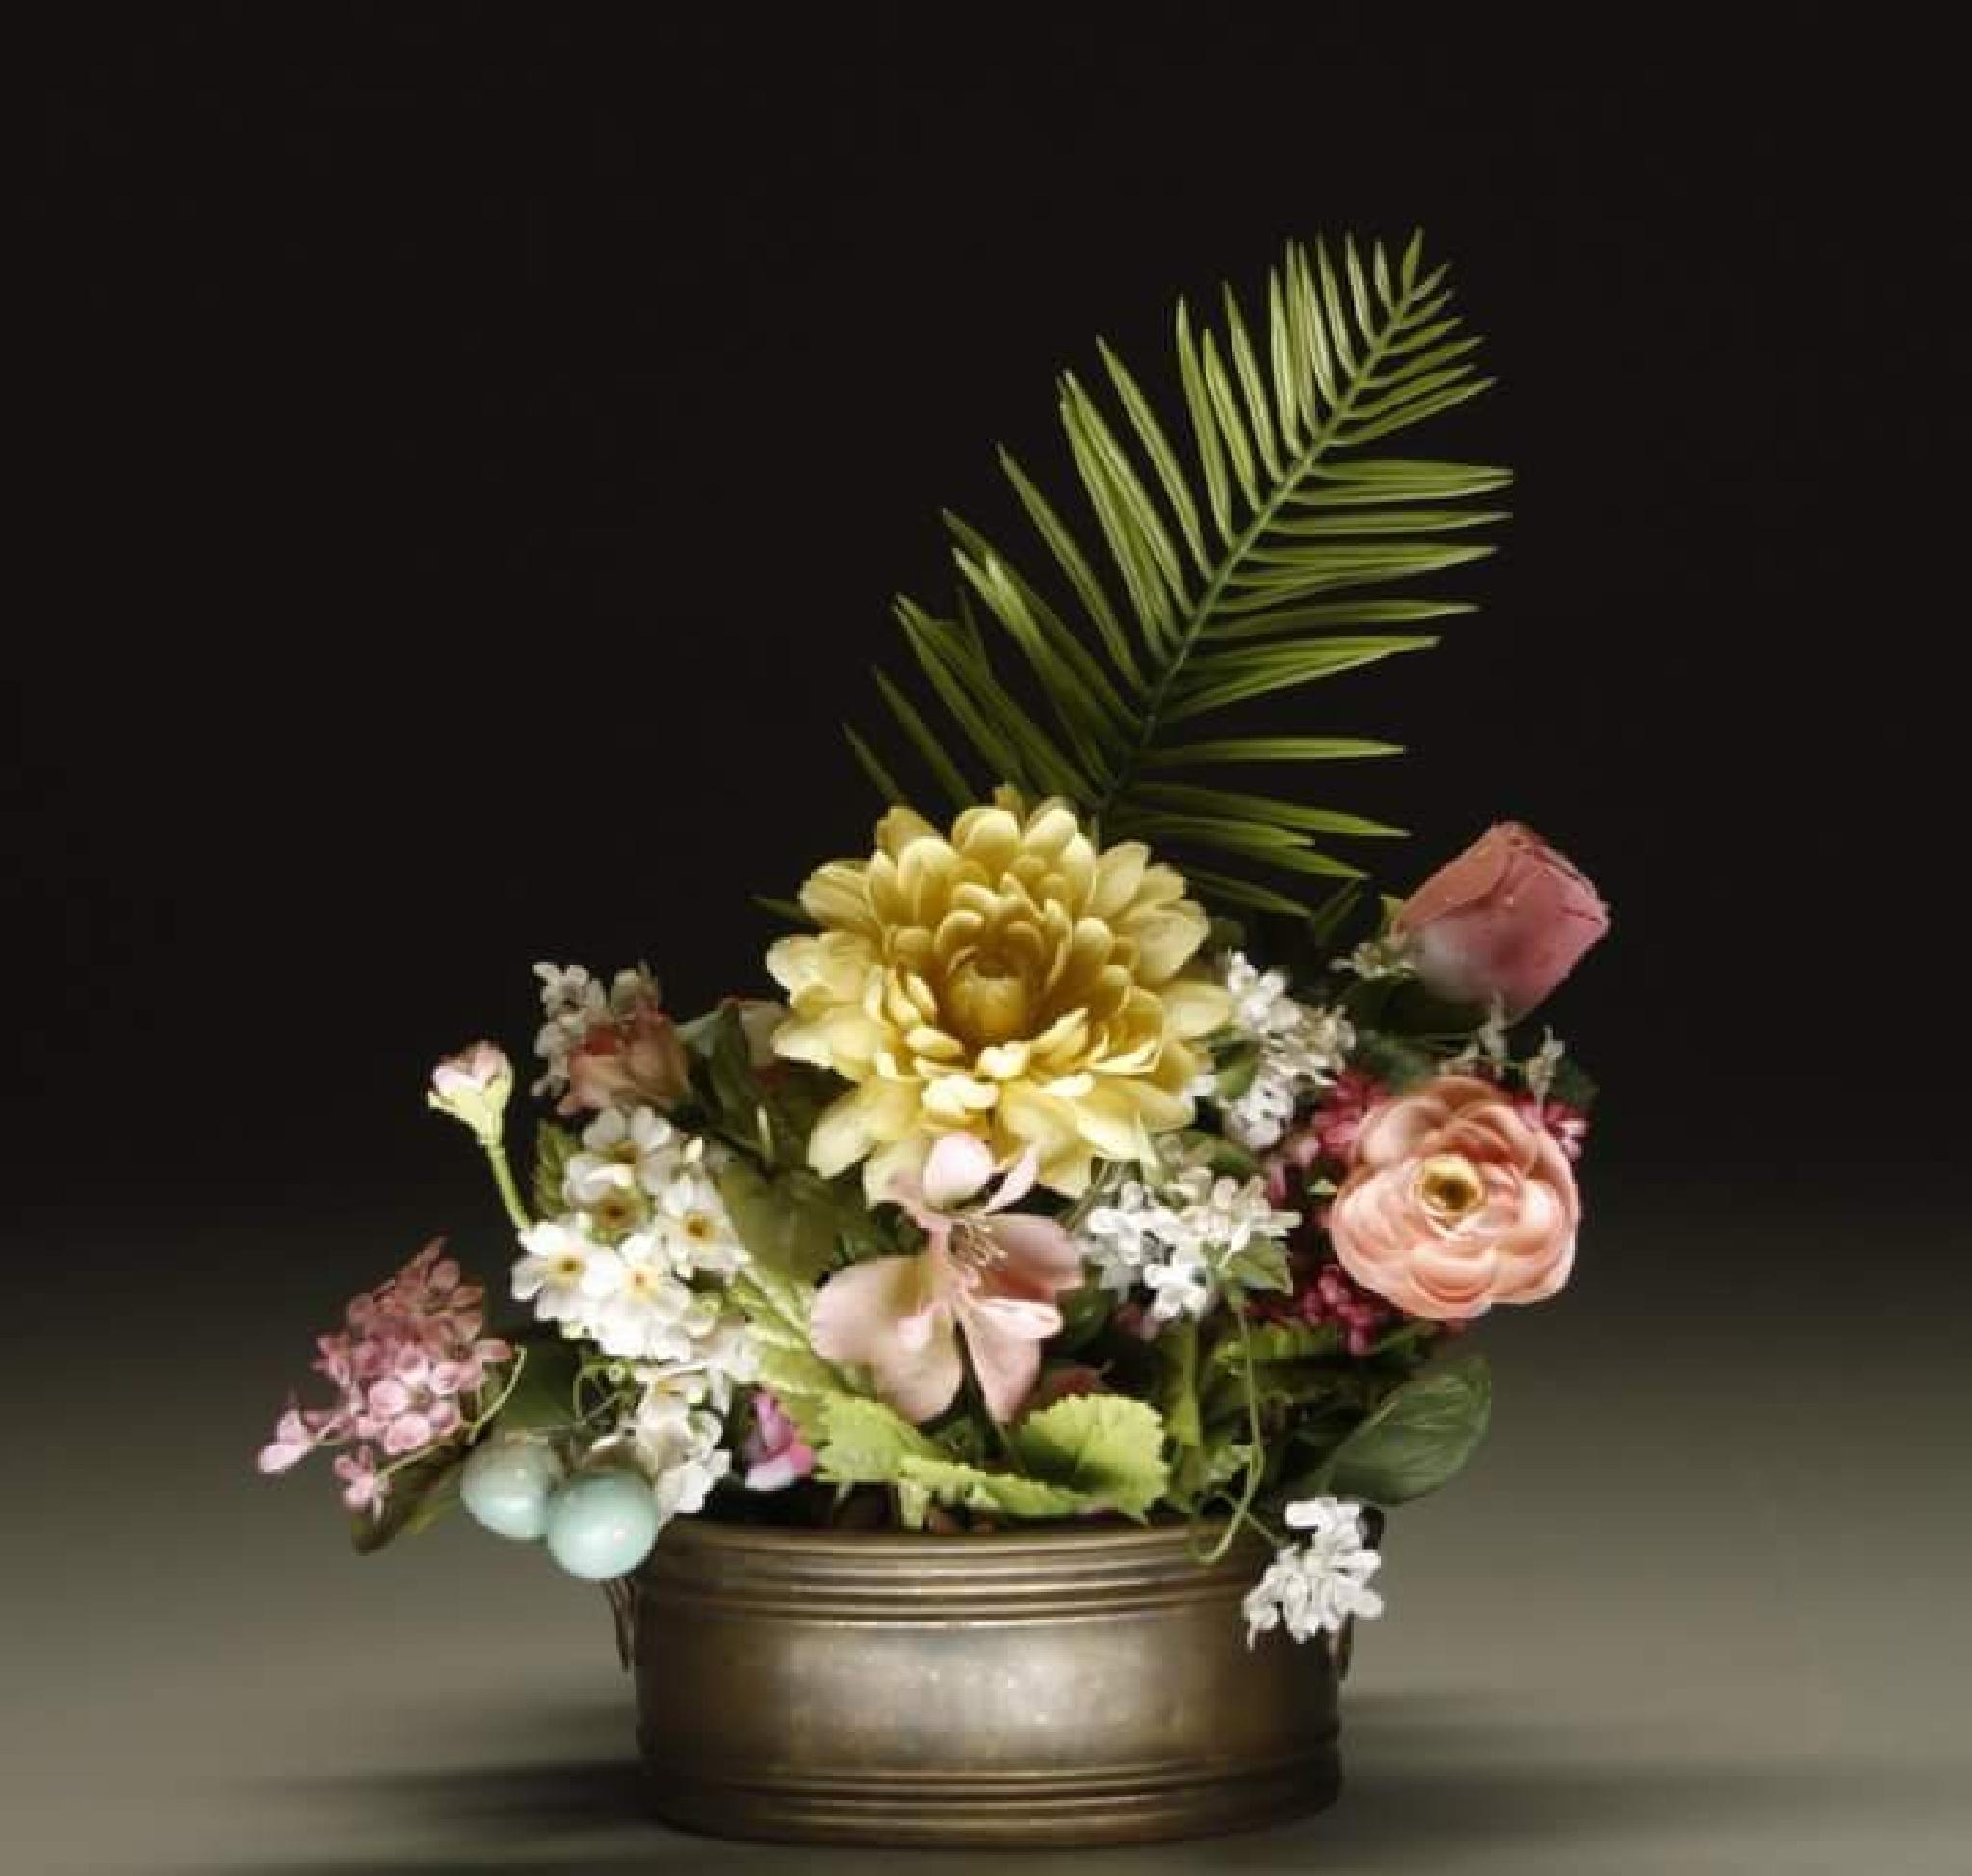 Flower Bouqet by Manishabajaj